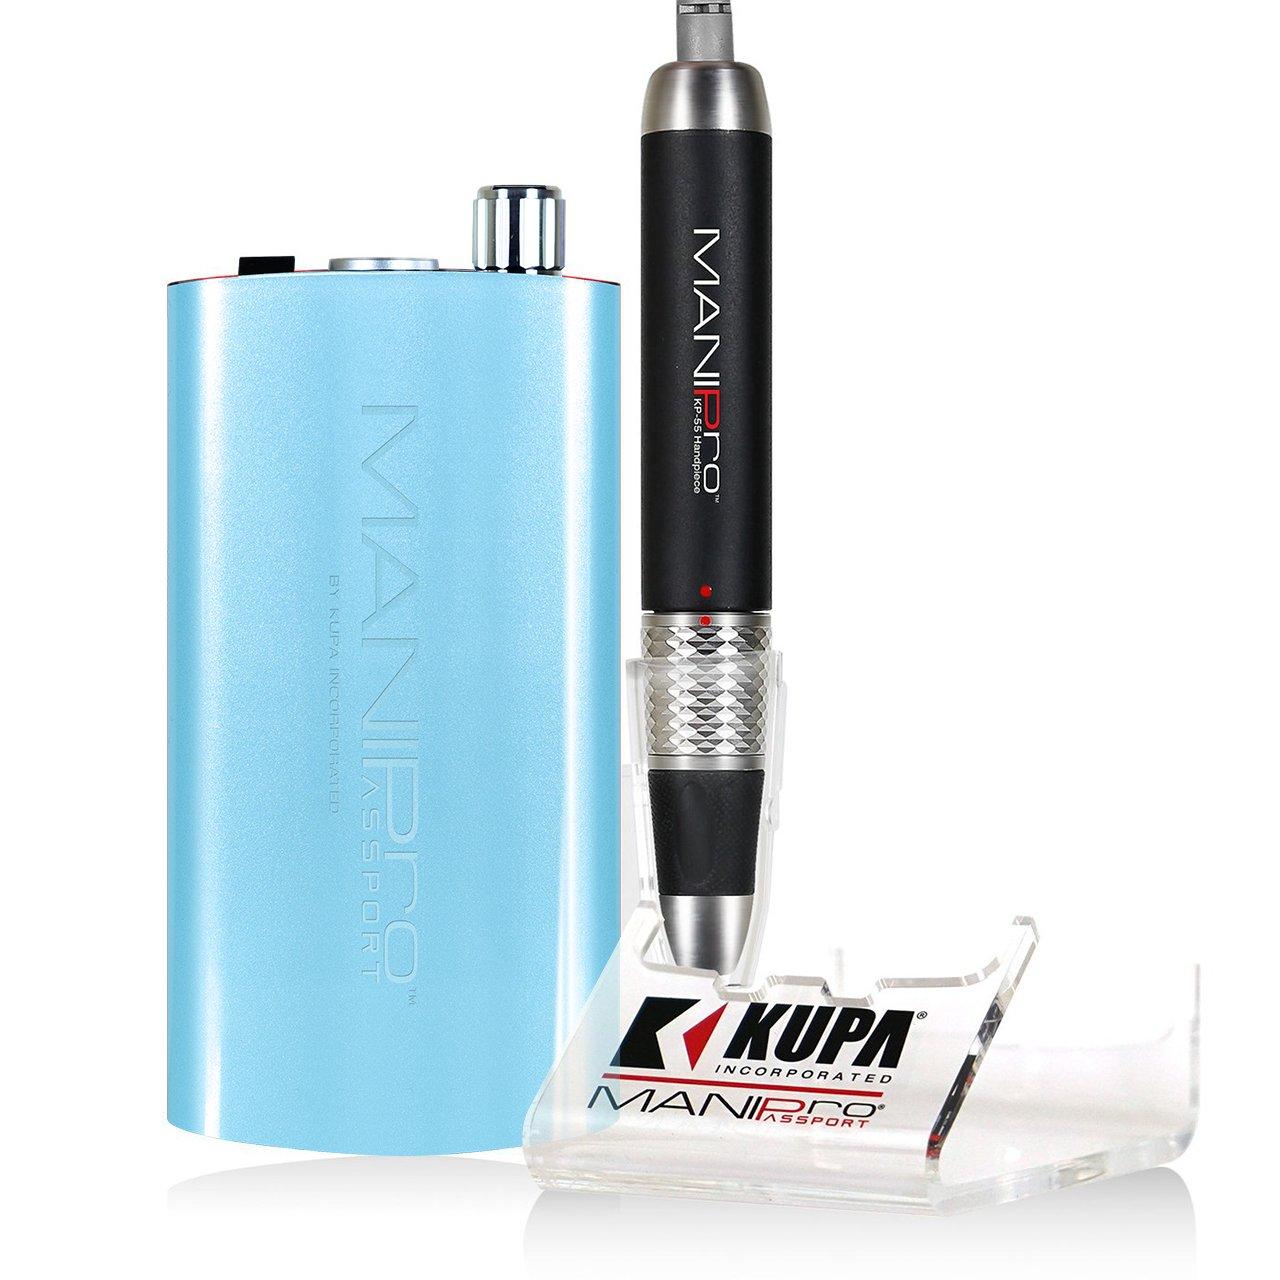 Kupa Mani Pro Passpport - TEAL Limited edition